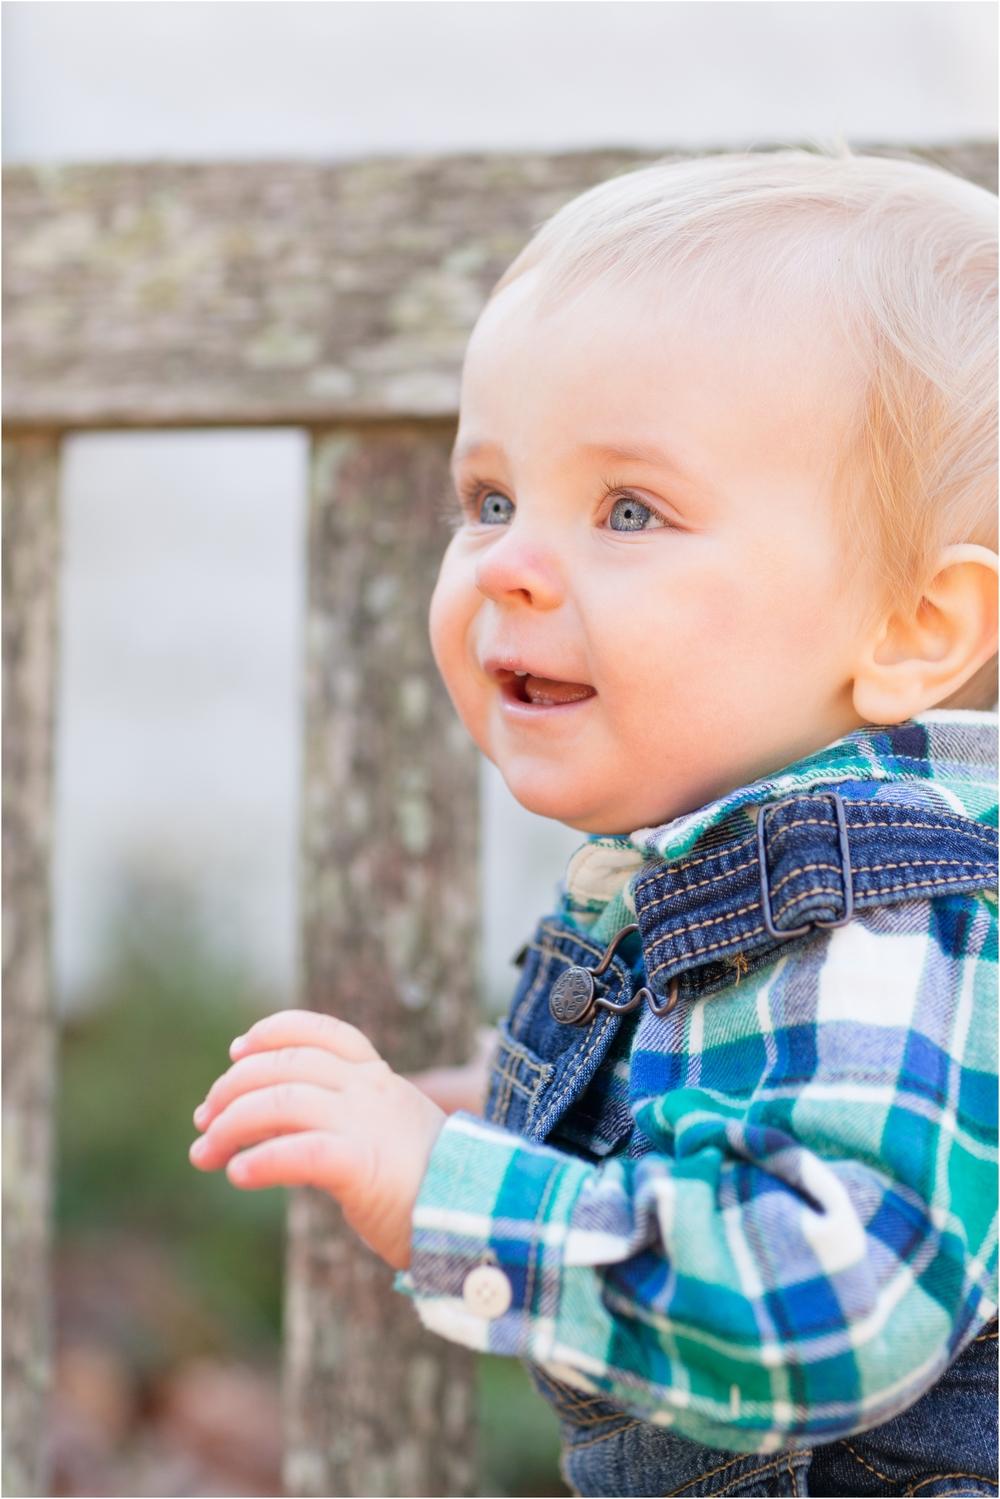 Baby-Bryce-1-Year-2014-105.jpg